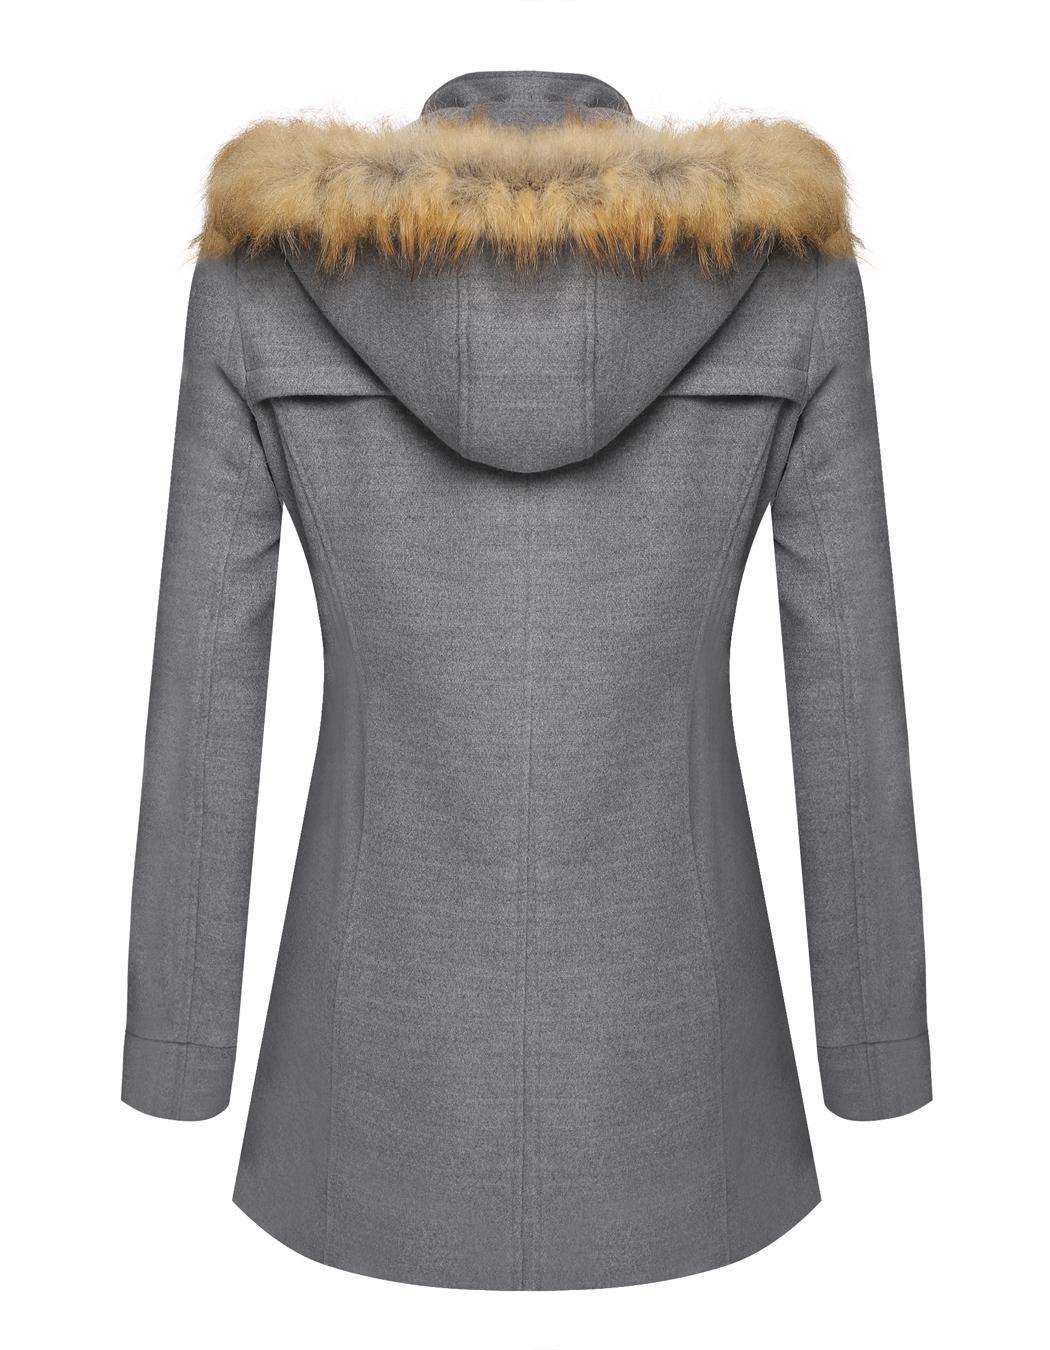 Women Detachable Faux Fur Hooded Long Solid Slim Wool Blend Coat 0